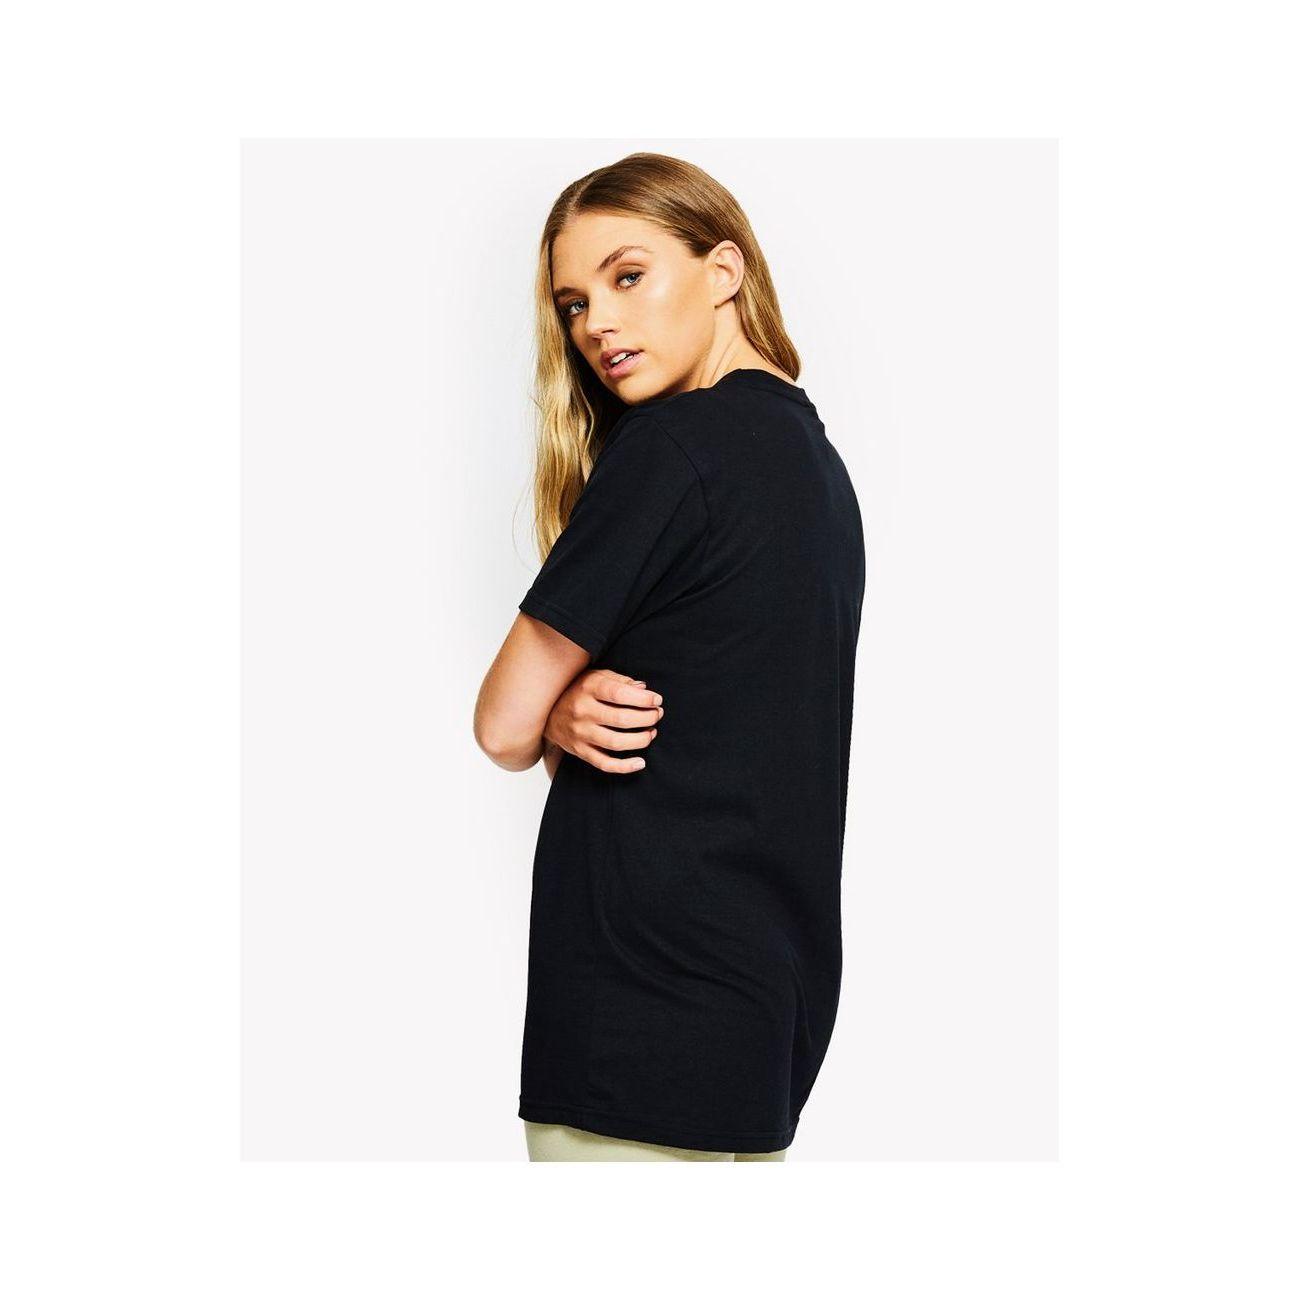 Athlétisme femme ELLESSE Ellesse Heritage Albany Tee-shirt Tee-shirt Mode Femme Pour Femmes - Noir - UK 12